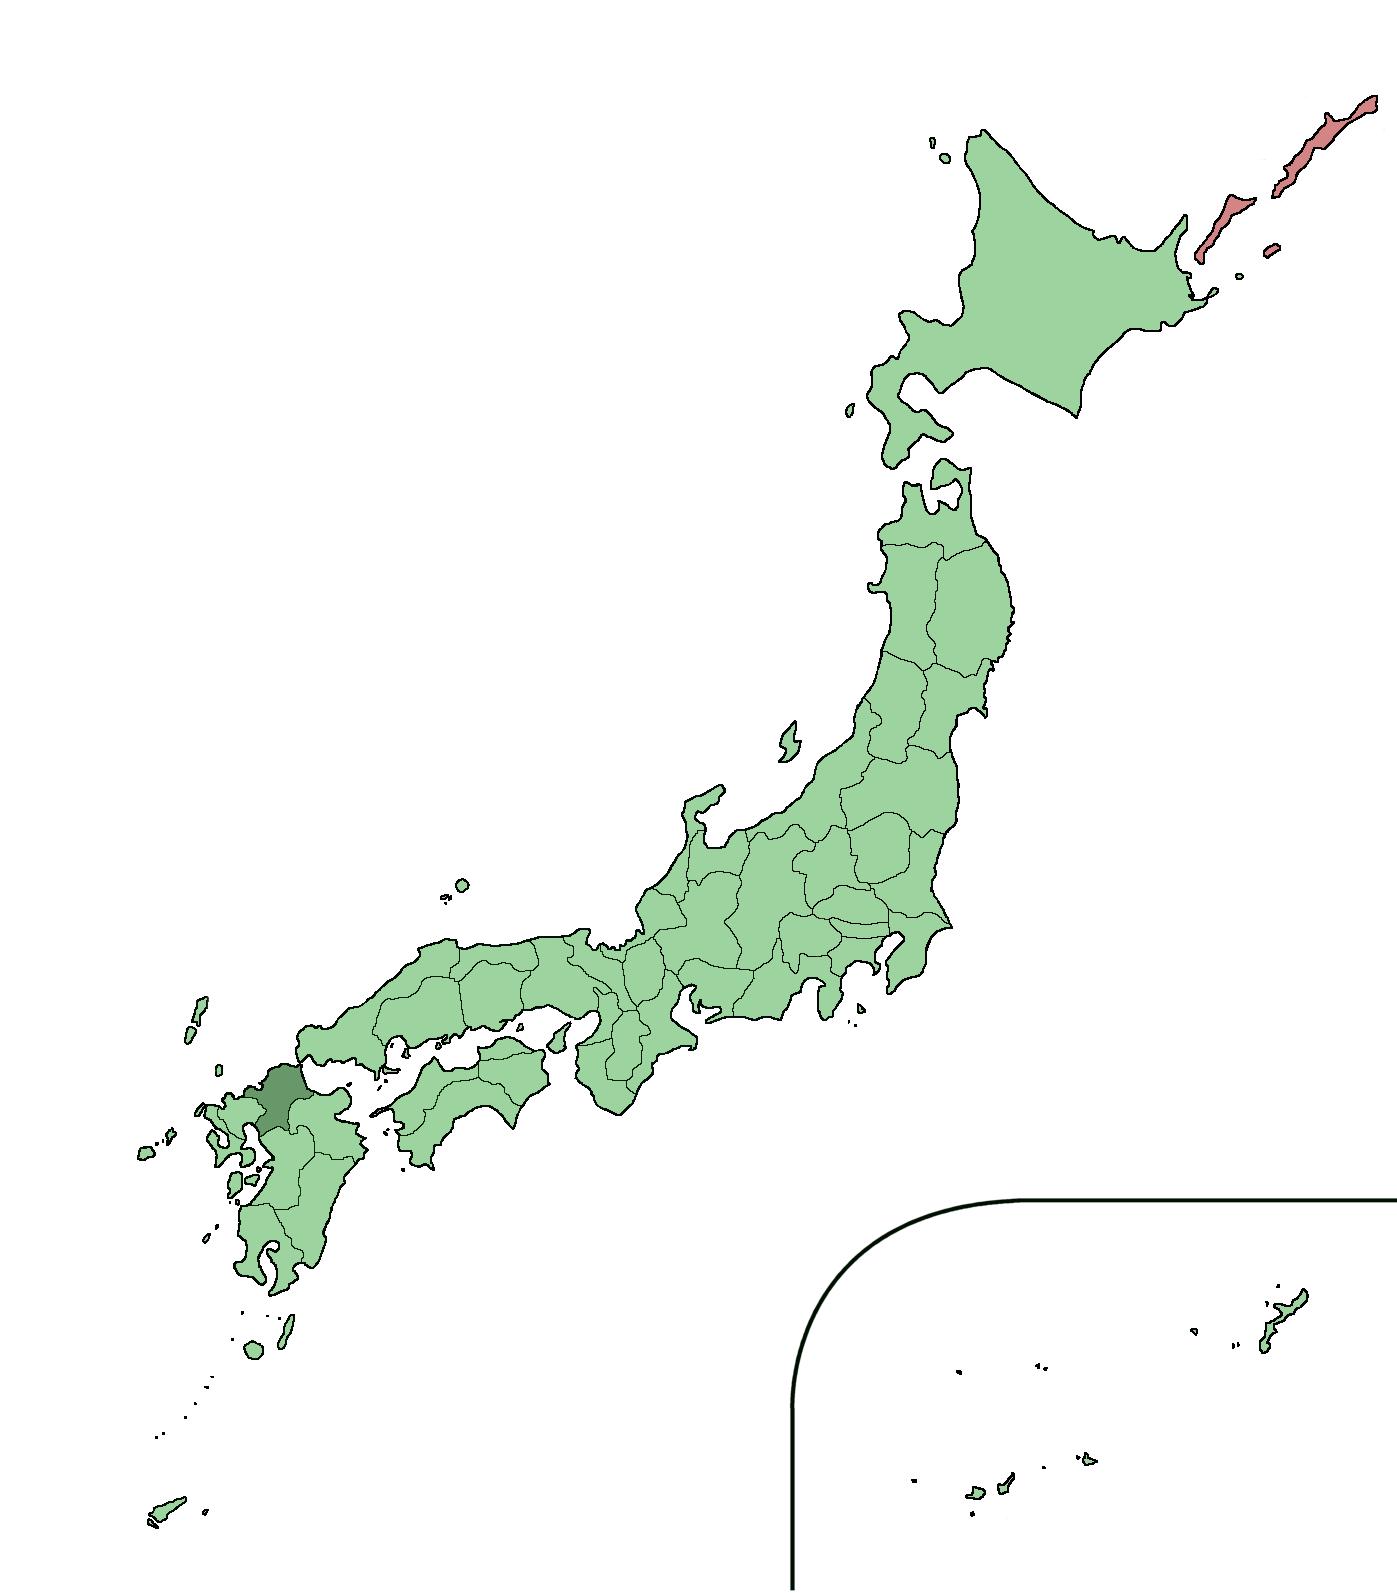 FileJapan Fukuoka largepng Wikimedia Commons